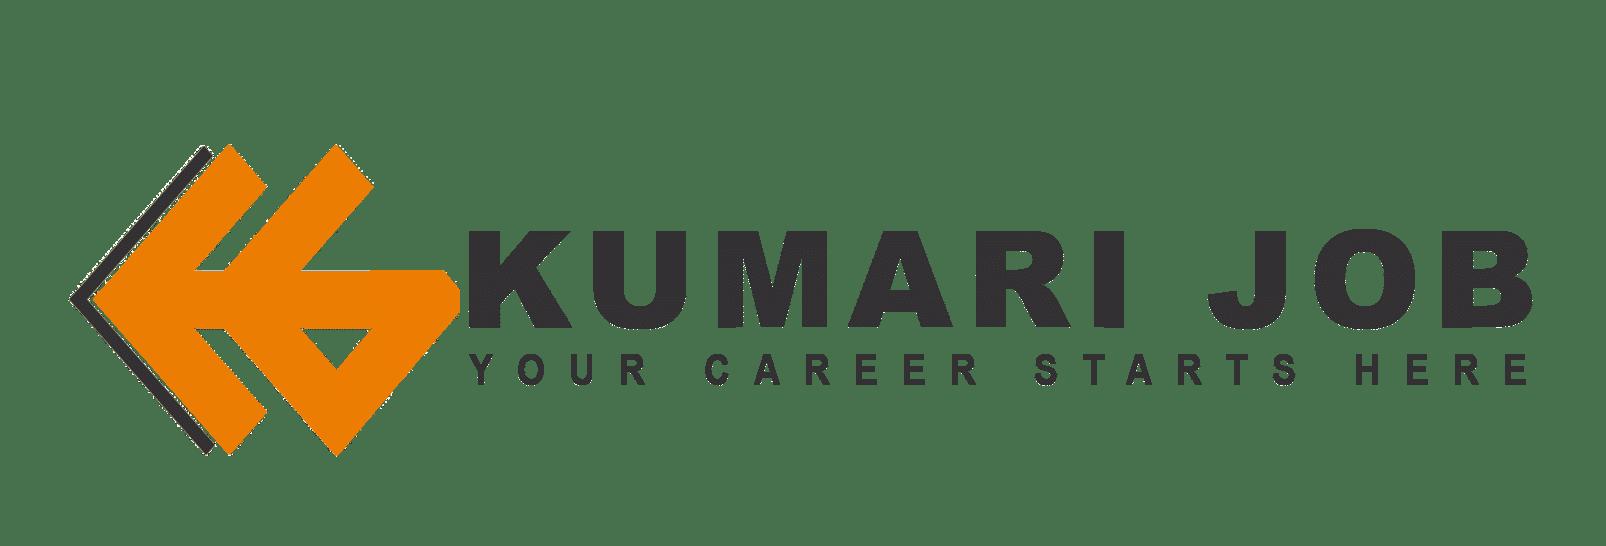 Kumari job Logo